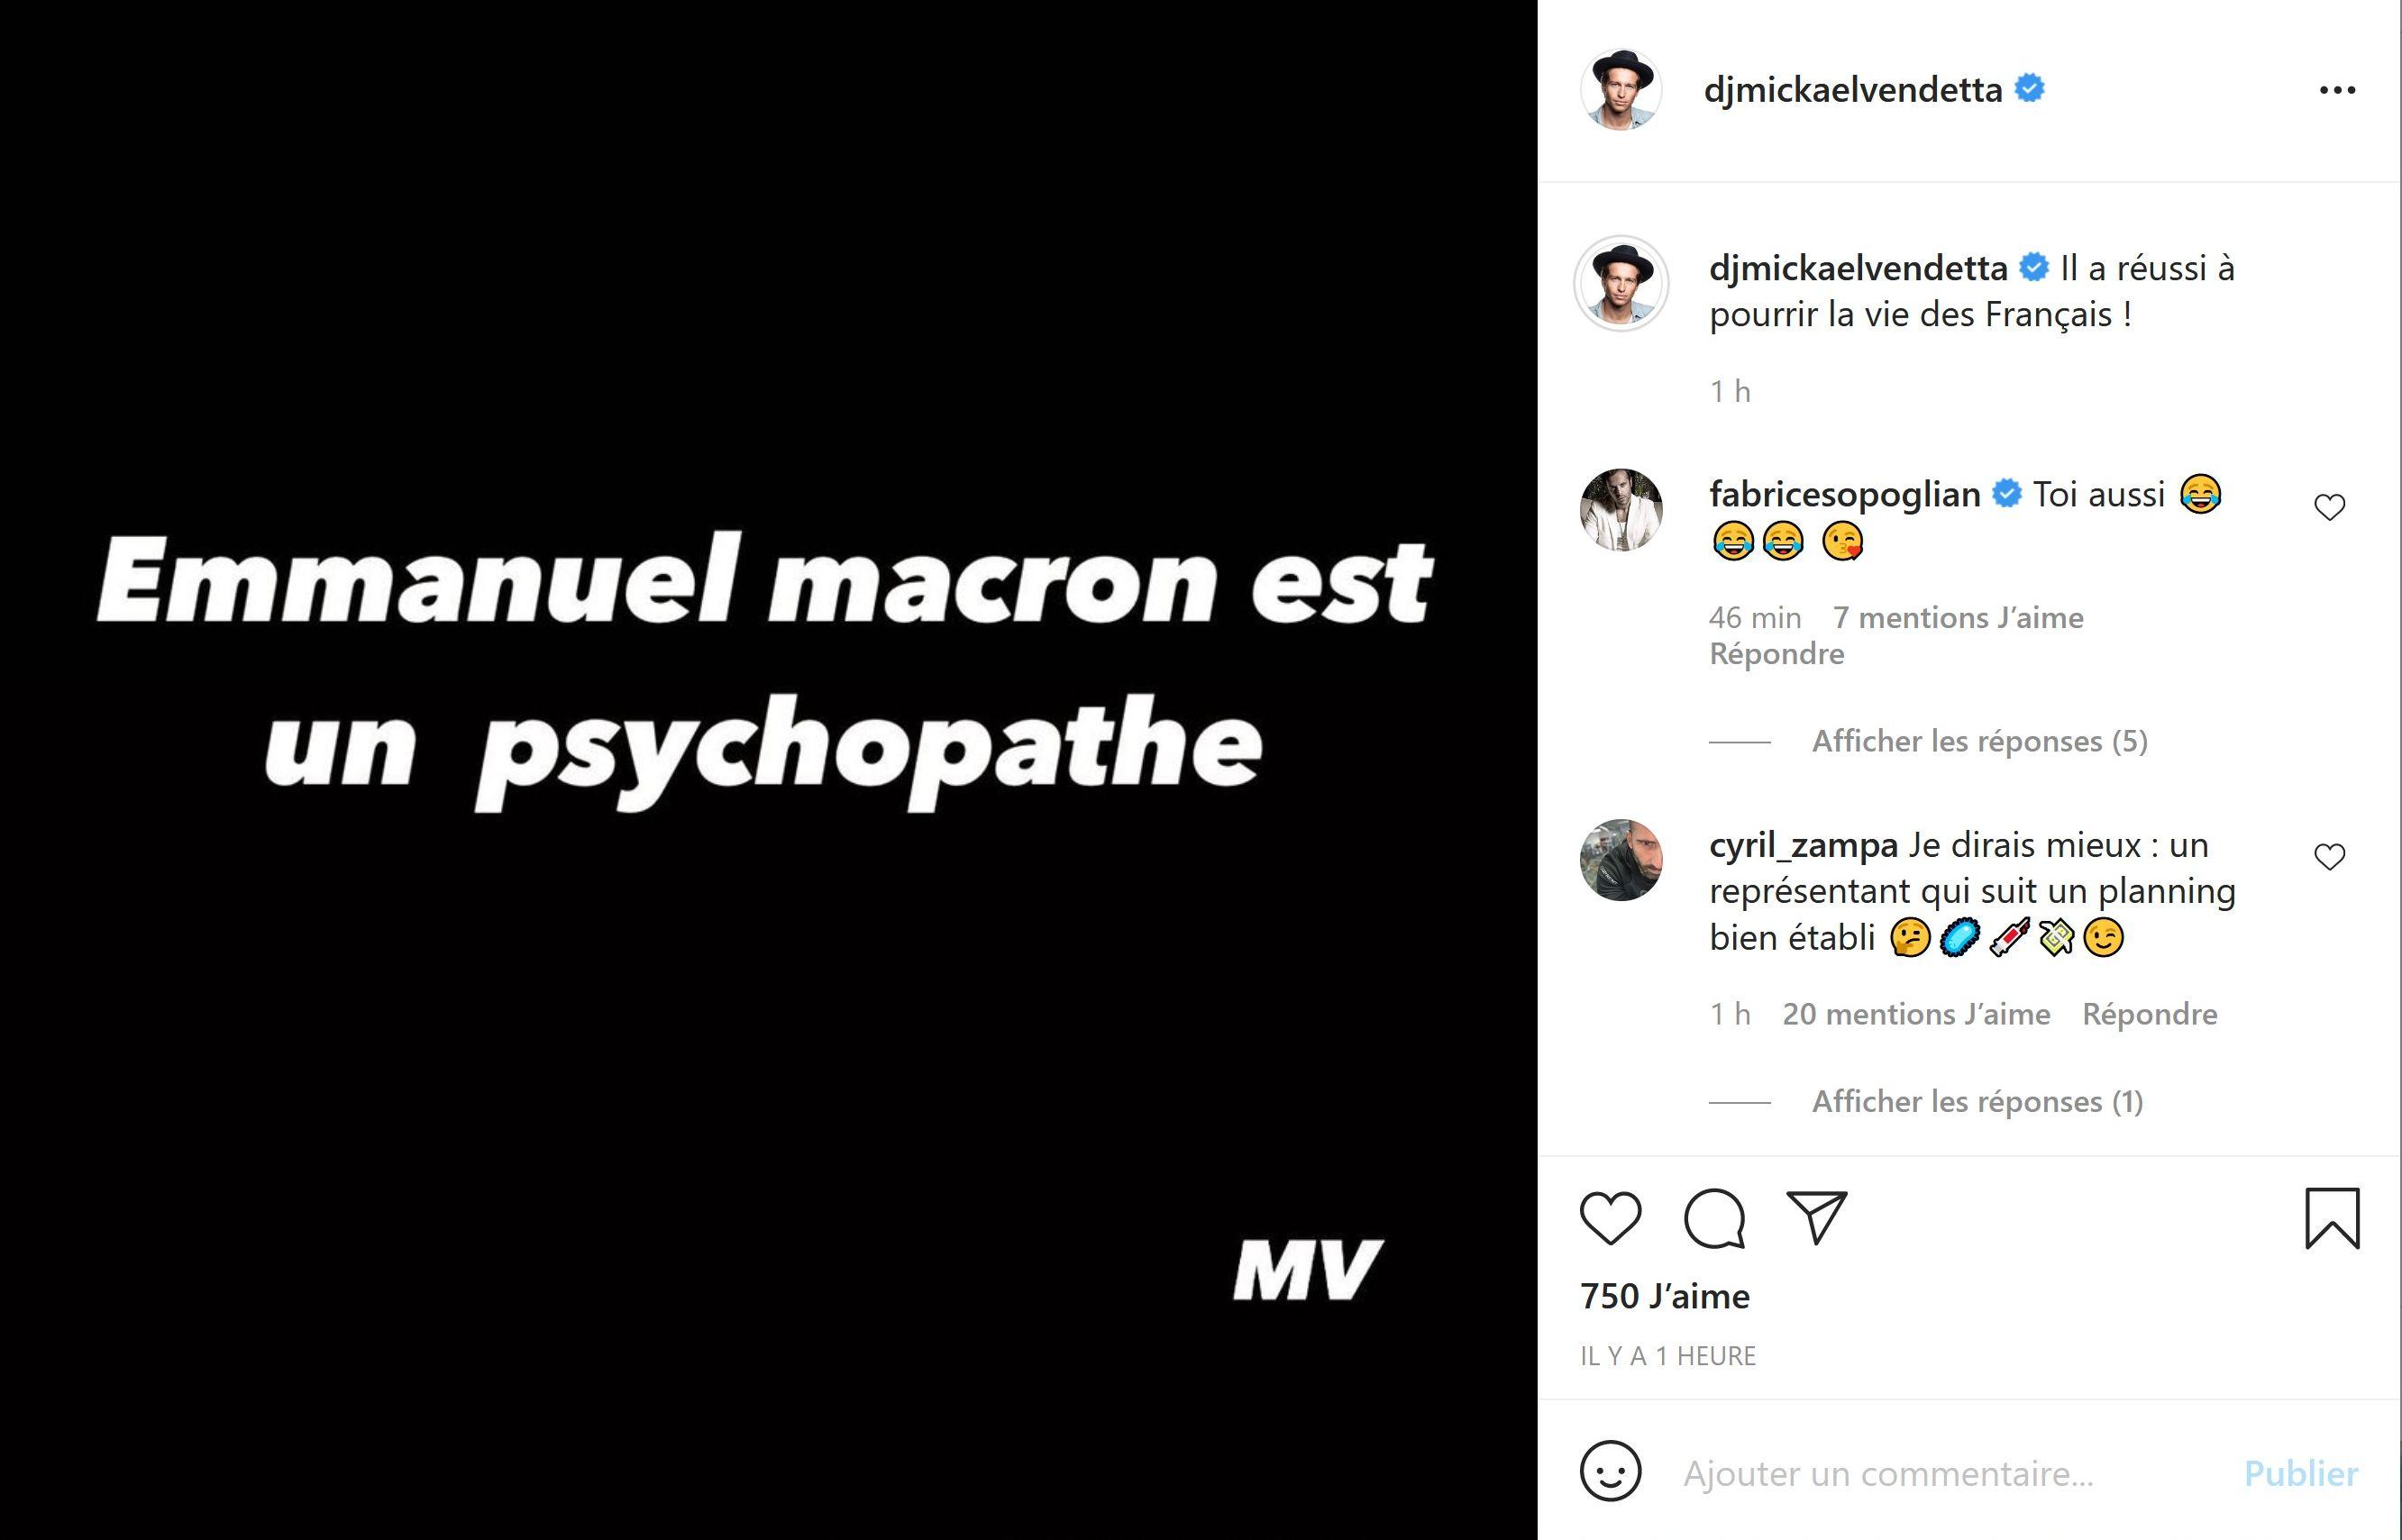 Mickaël Vendetta qualifie Emmanuel Macron de psychopathe, Fabrice Sopoglian intervient !